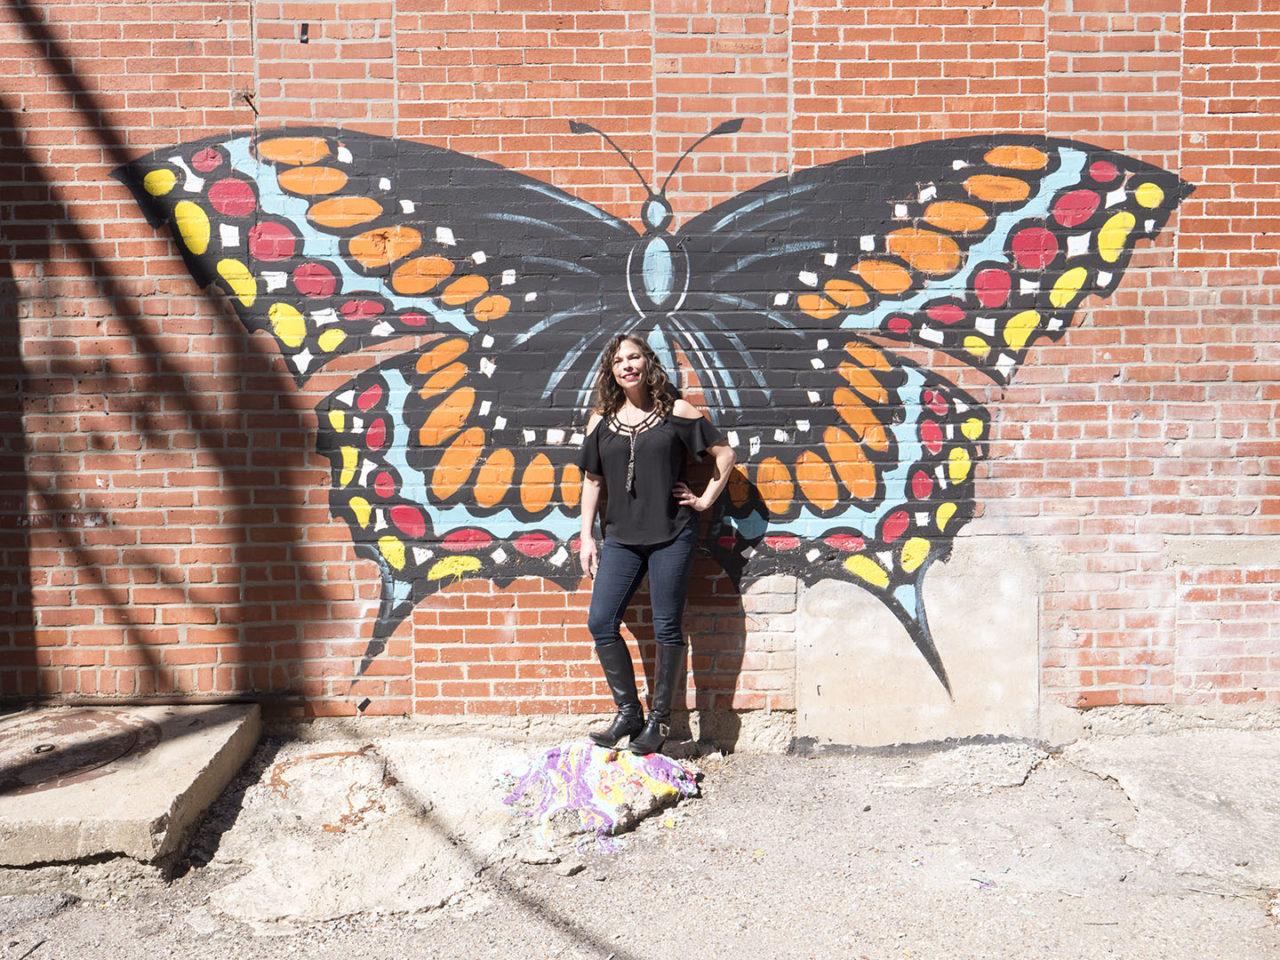 Heide at Urban Art Alley